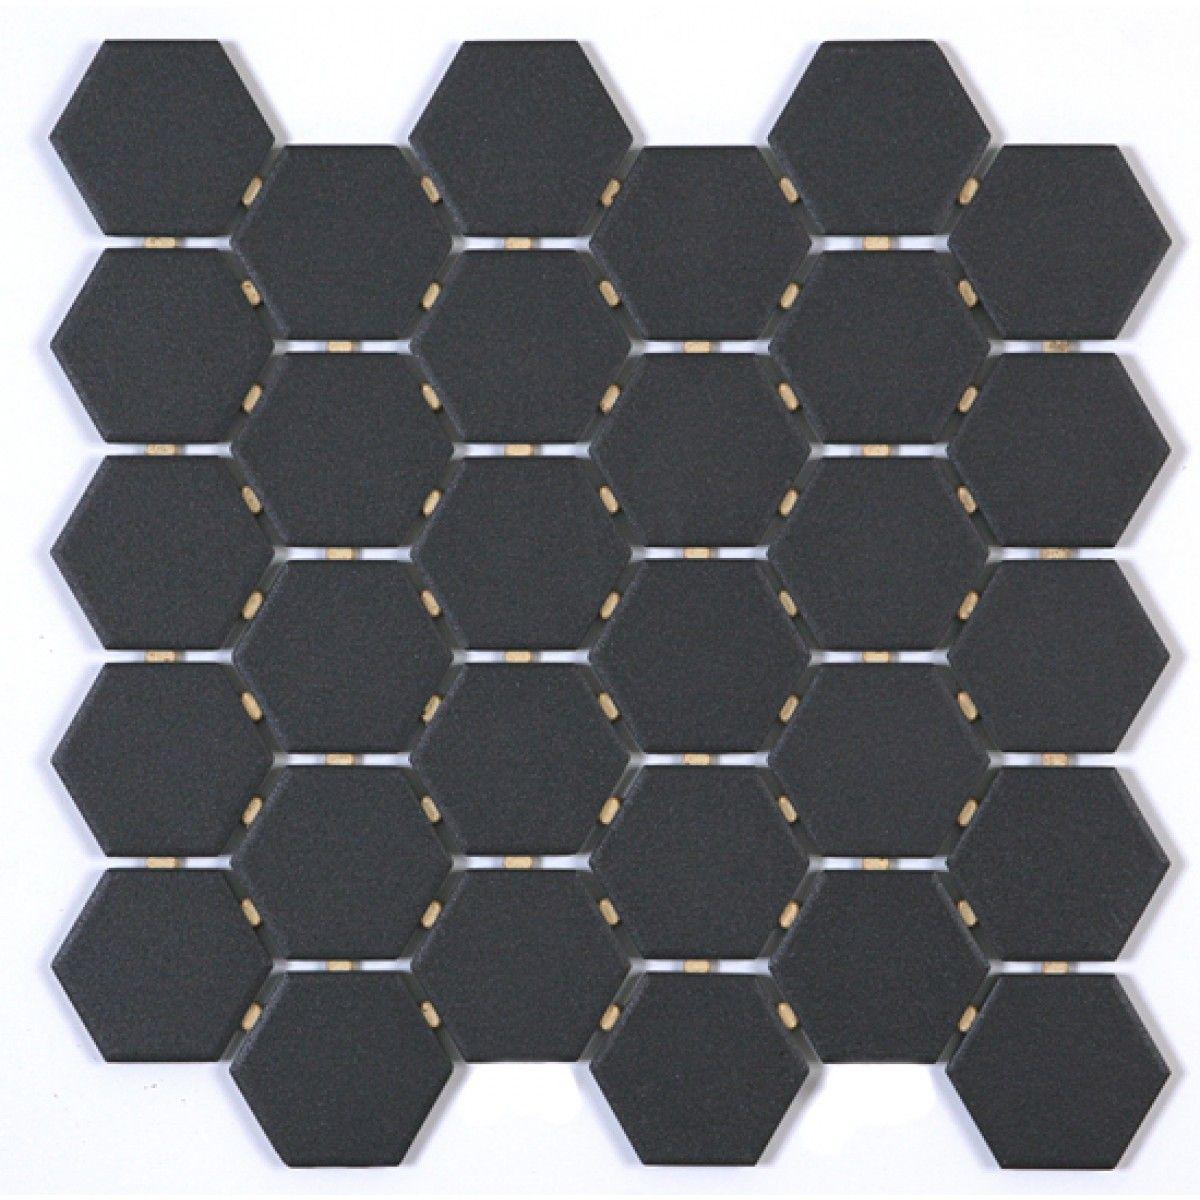 Athens Black Unglazed Hexagon 2 Inch Mosaic Ceramic Floor Tile